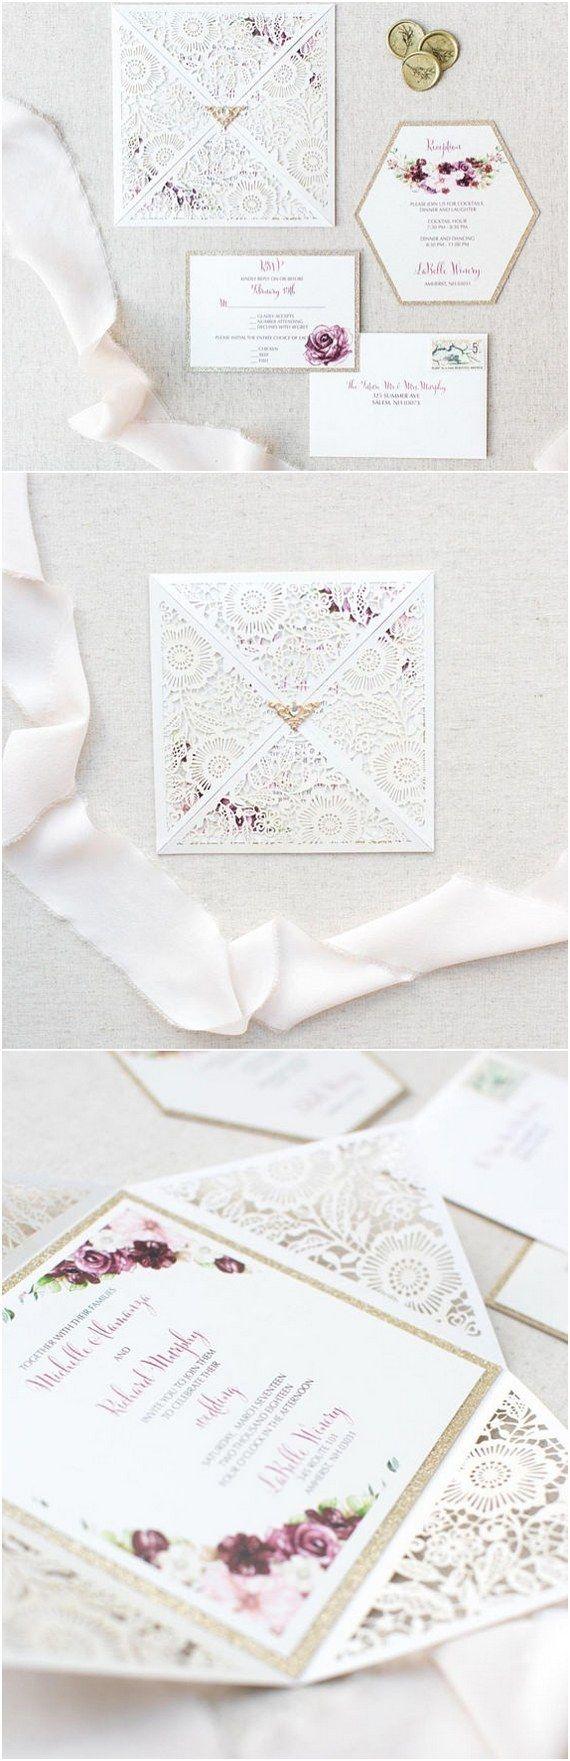 1617 best Wedding Invitations images on Pinterest